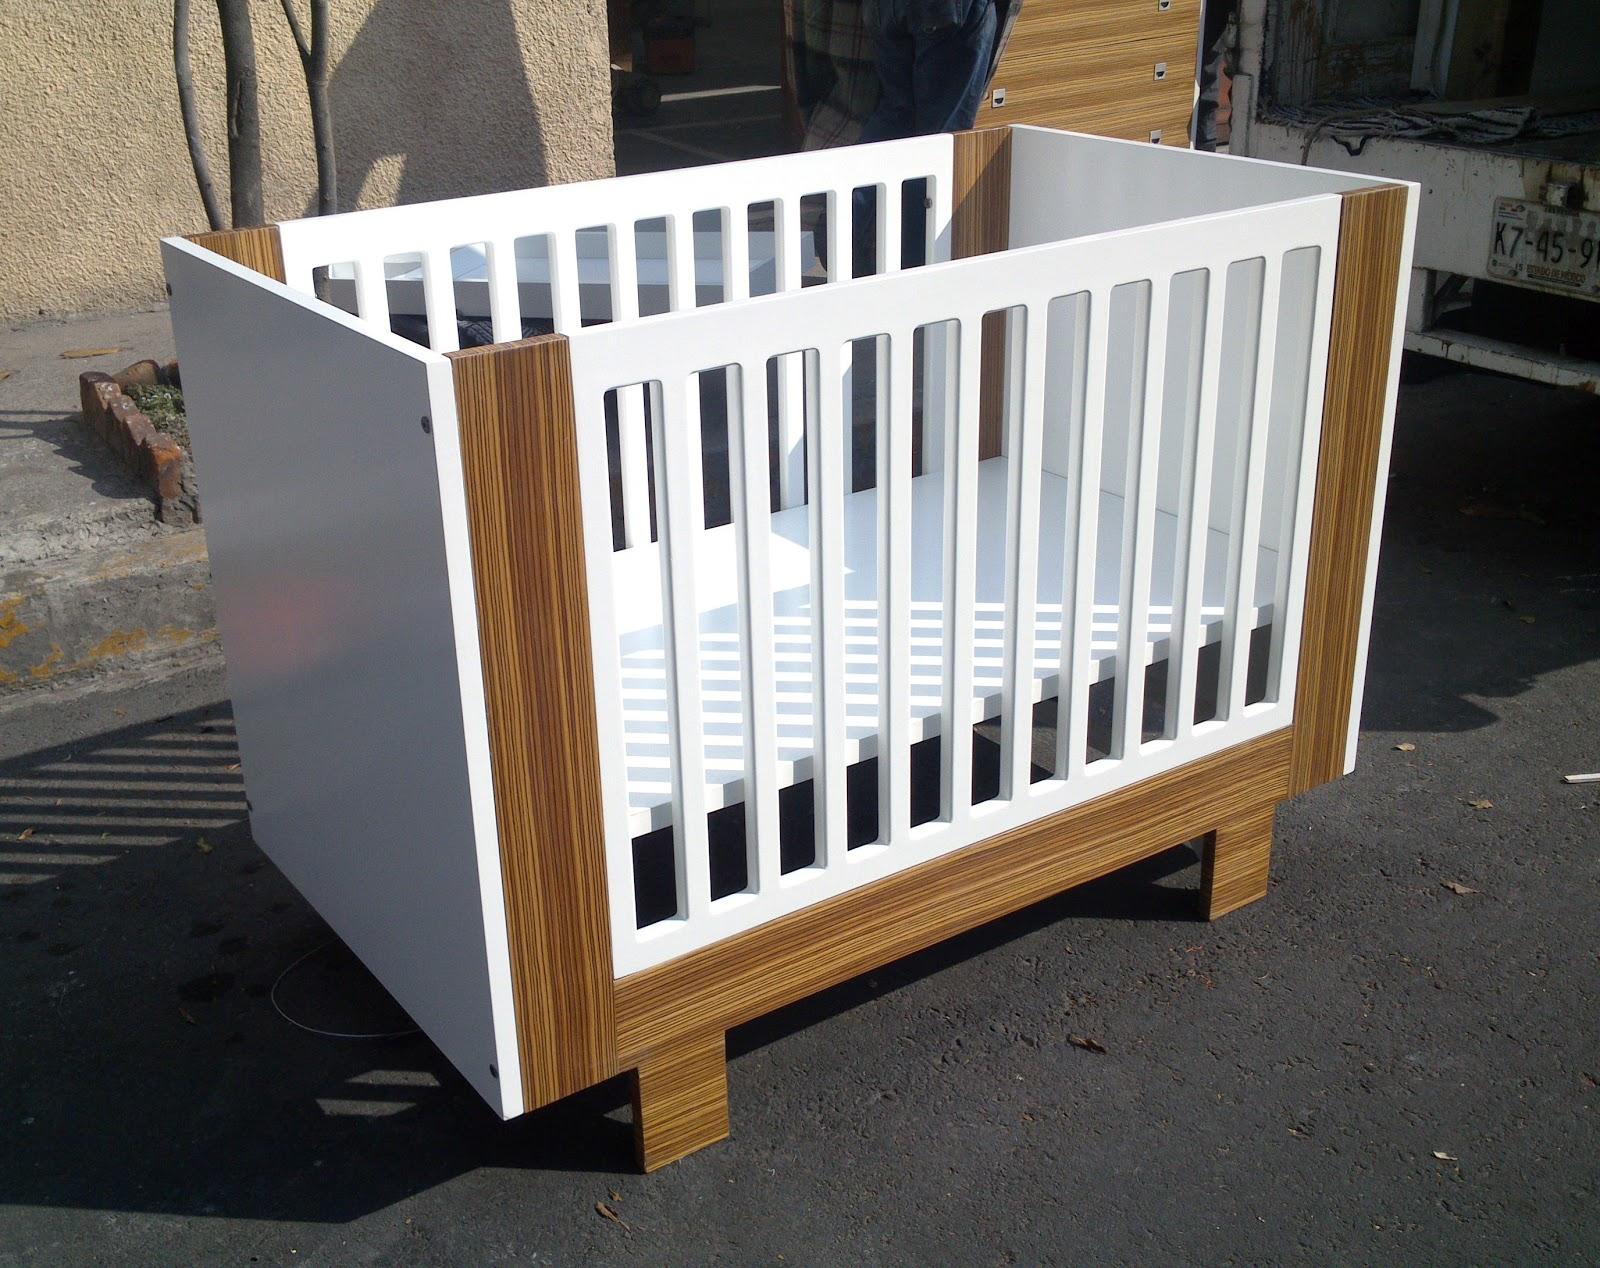 Recámara Bebé | Muebles sobre Diseño AVL